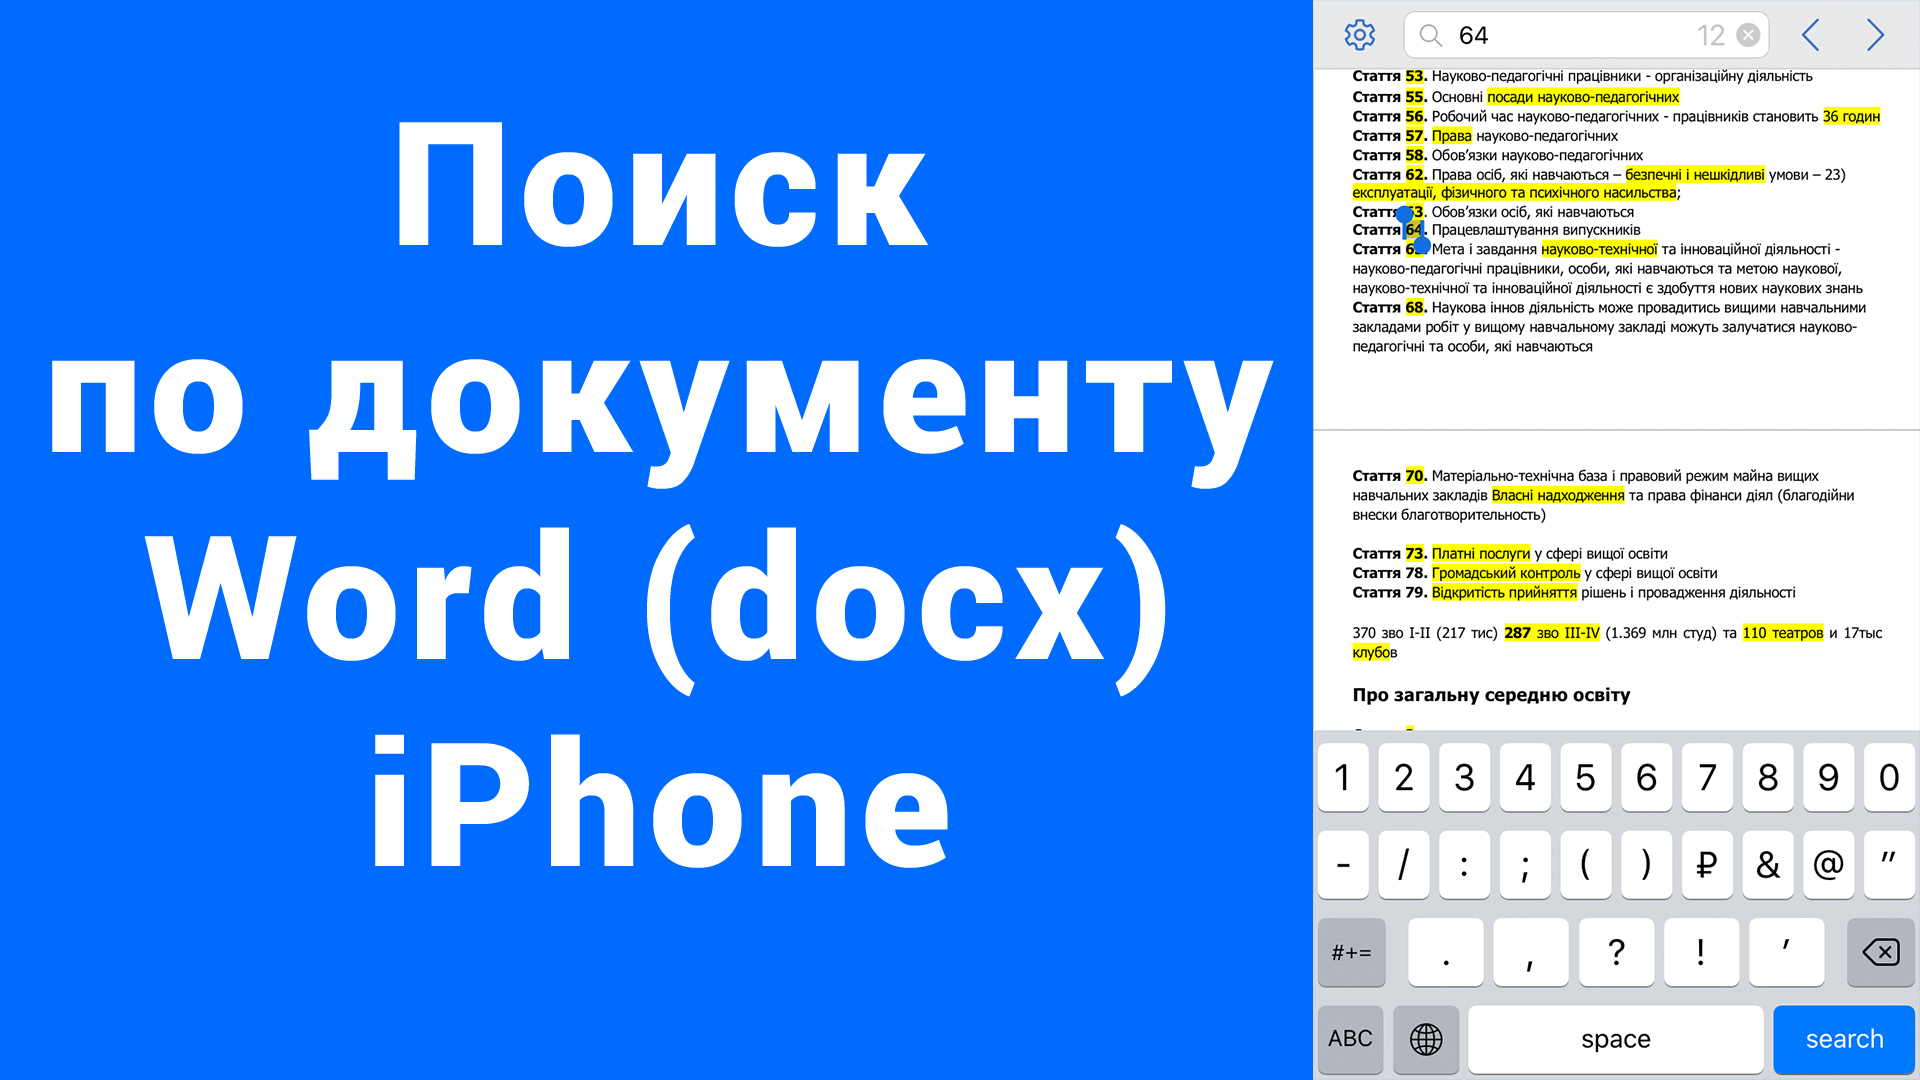 Поиск текста по документу WORD iPhone (doc, docx)